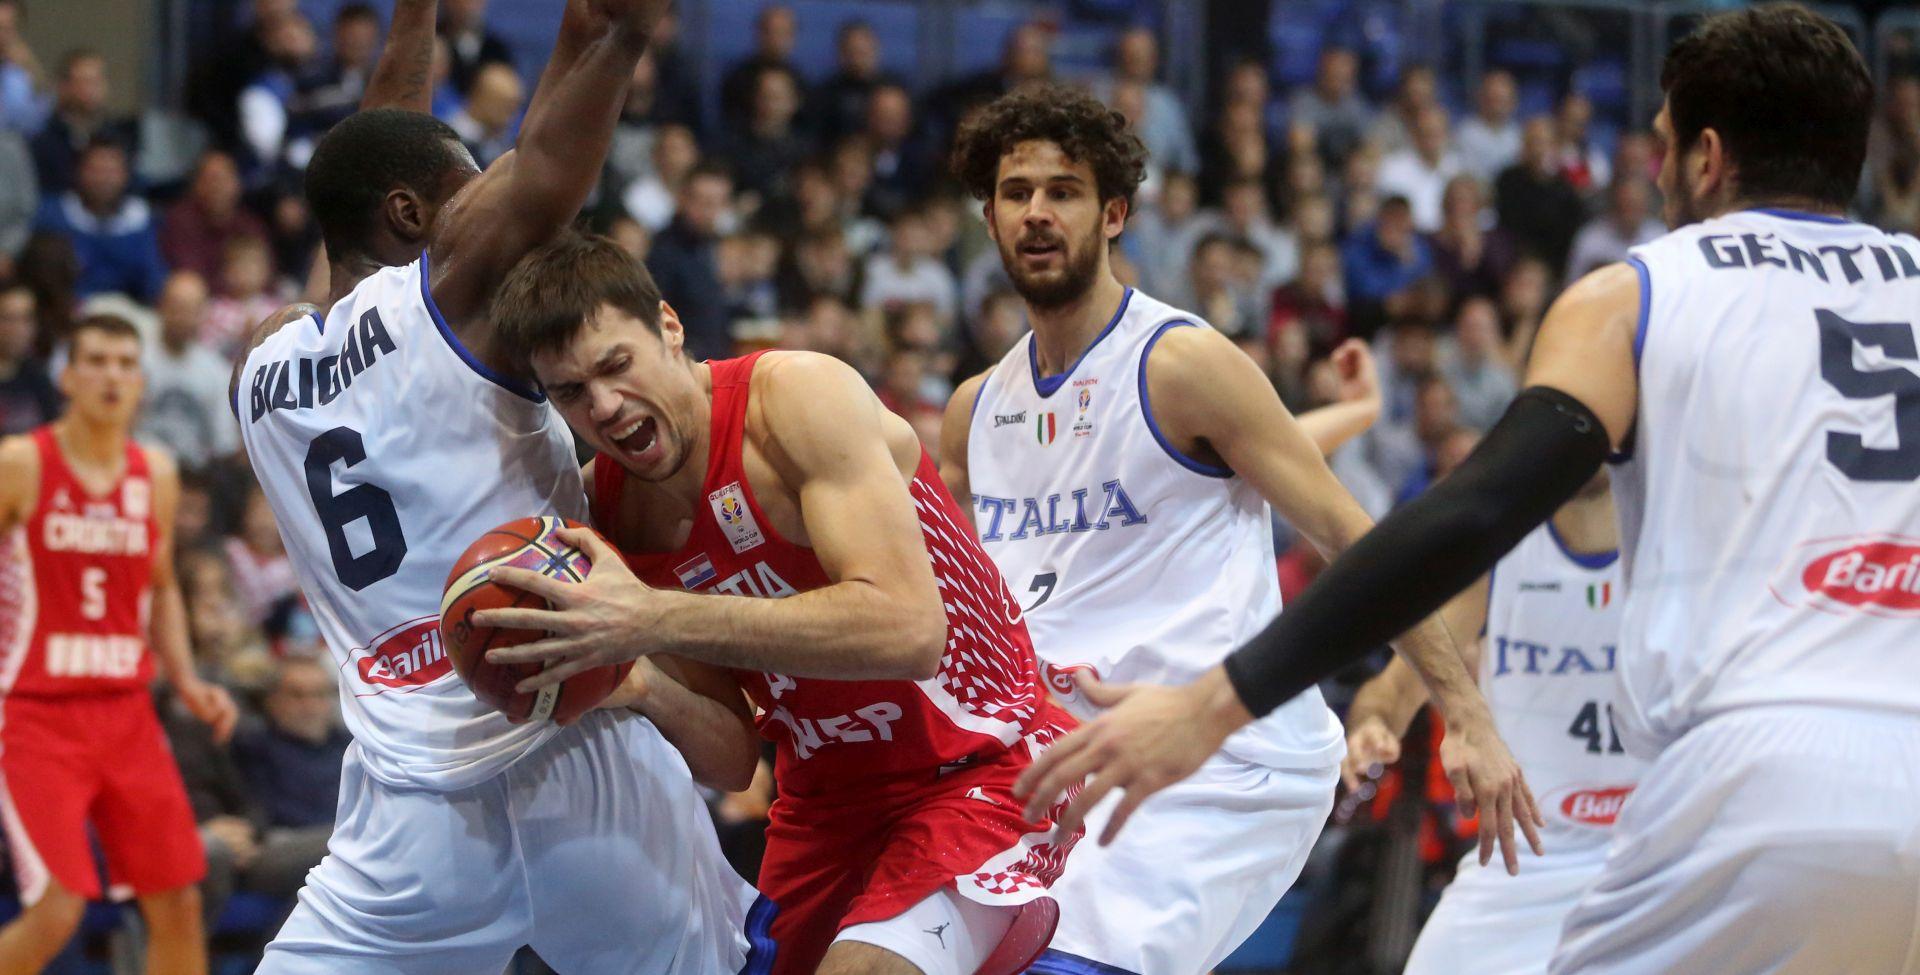 Novi poraz hrvatskih košarkaša